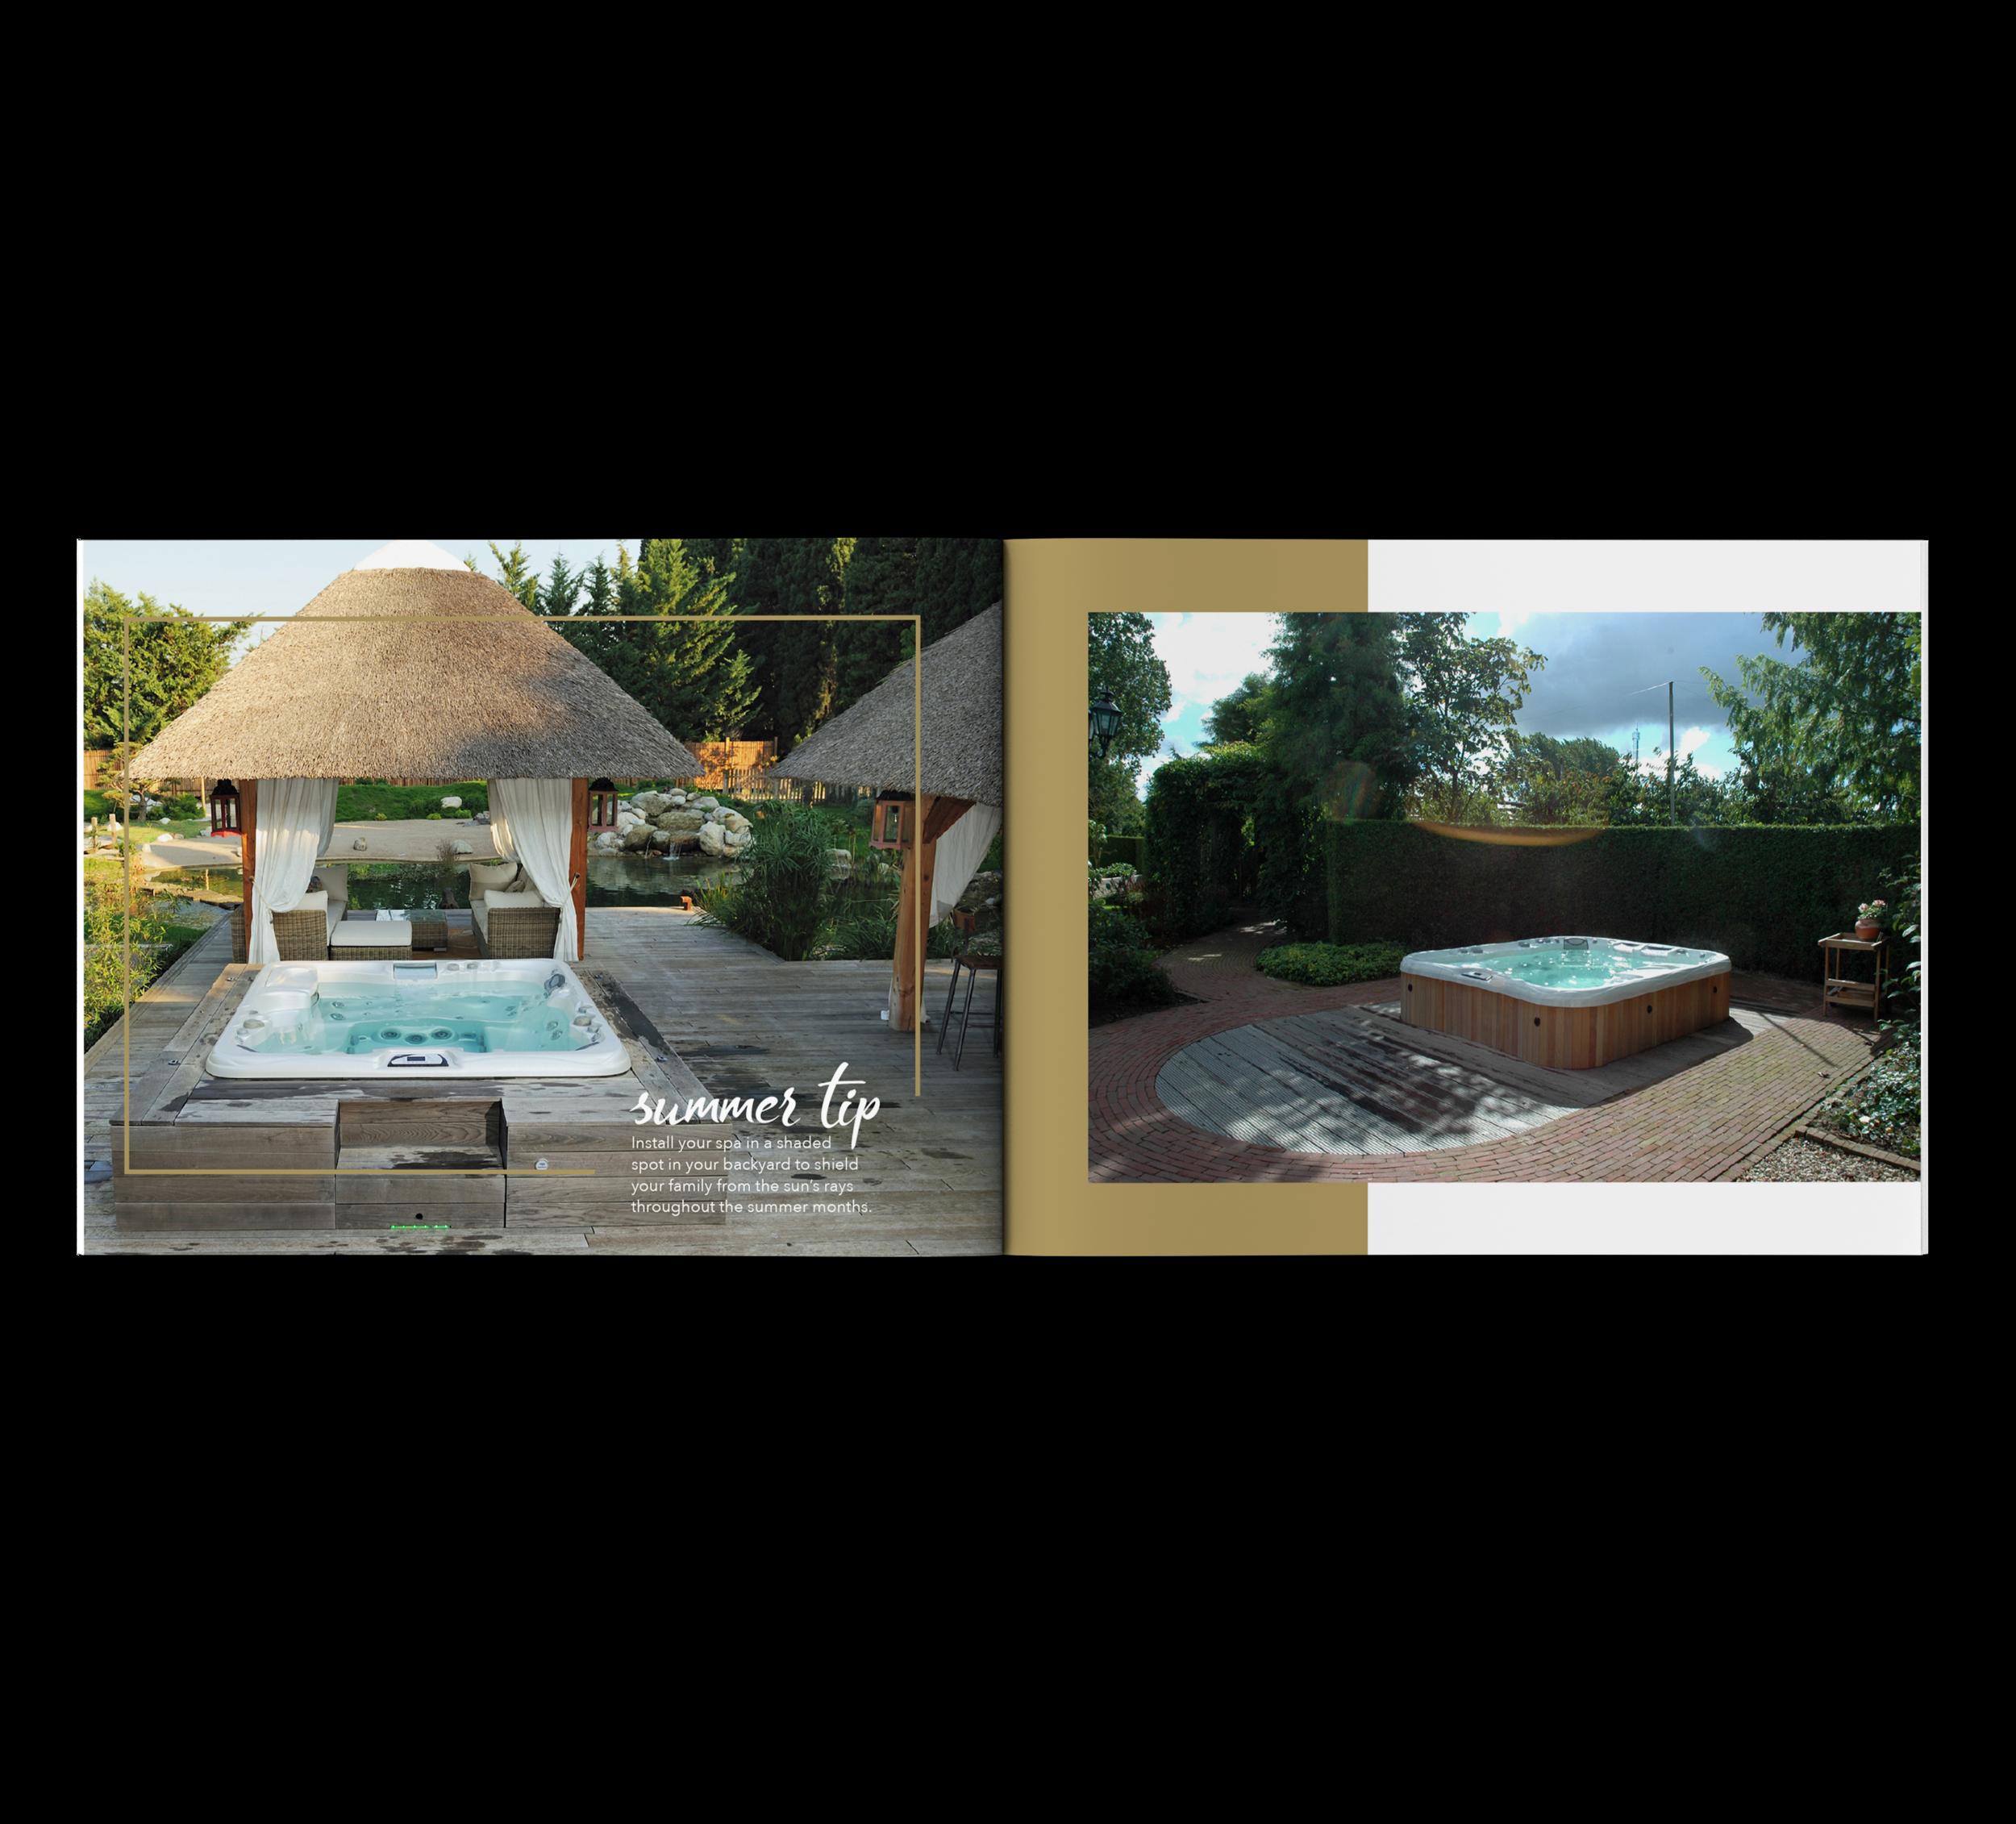 sundance-spas-lookbook-design-inspiration-interior-spread.png